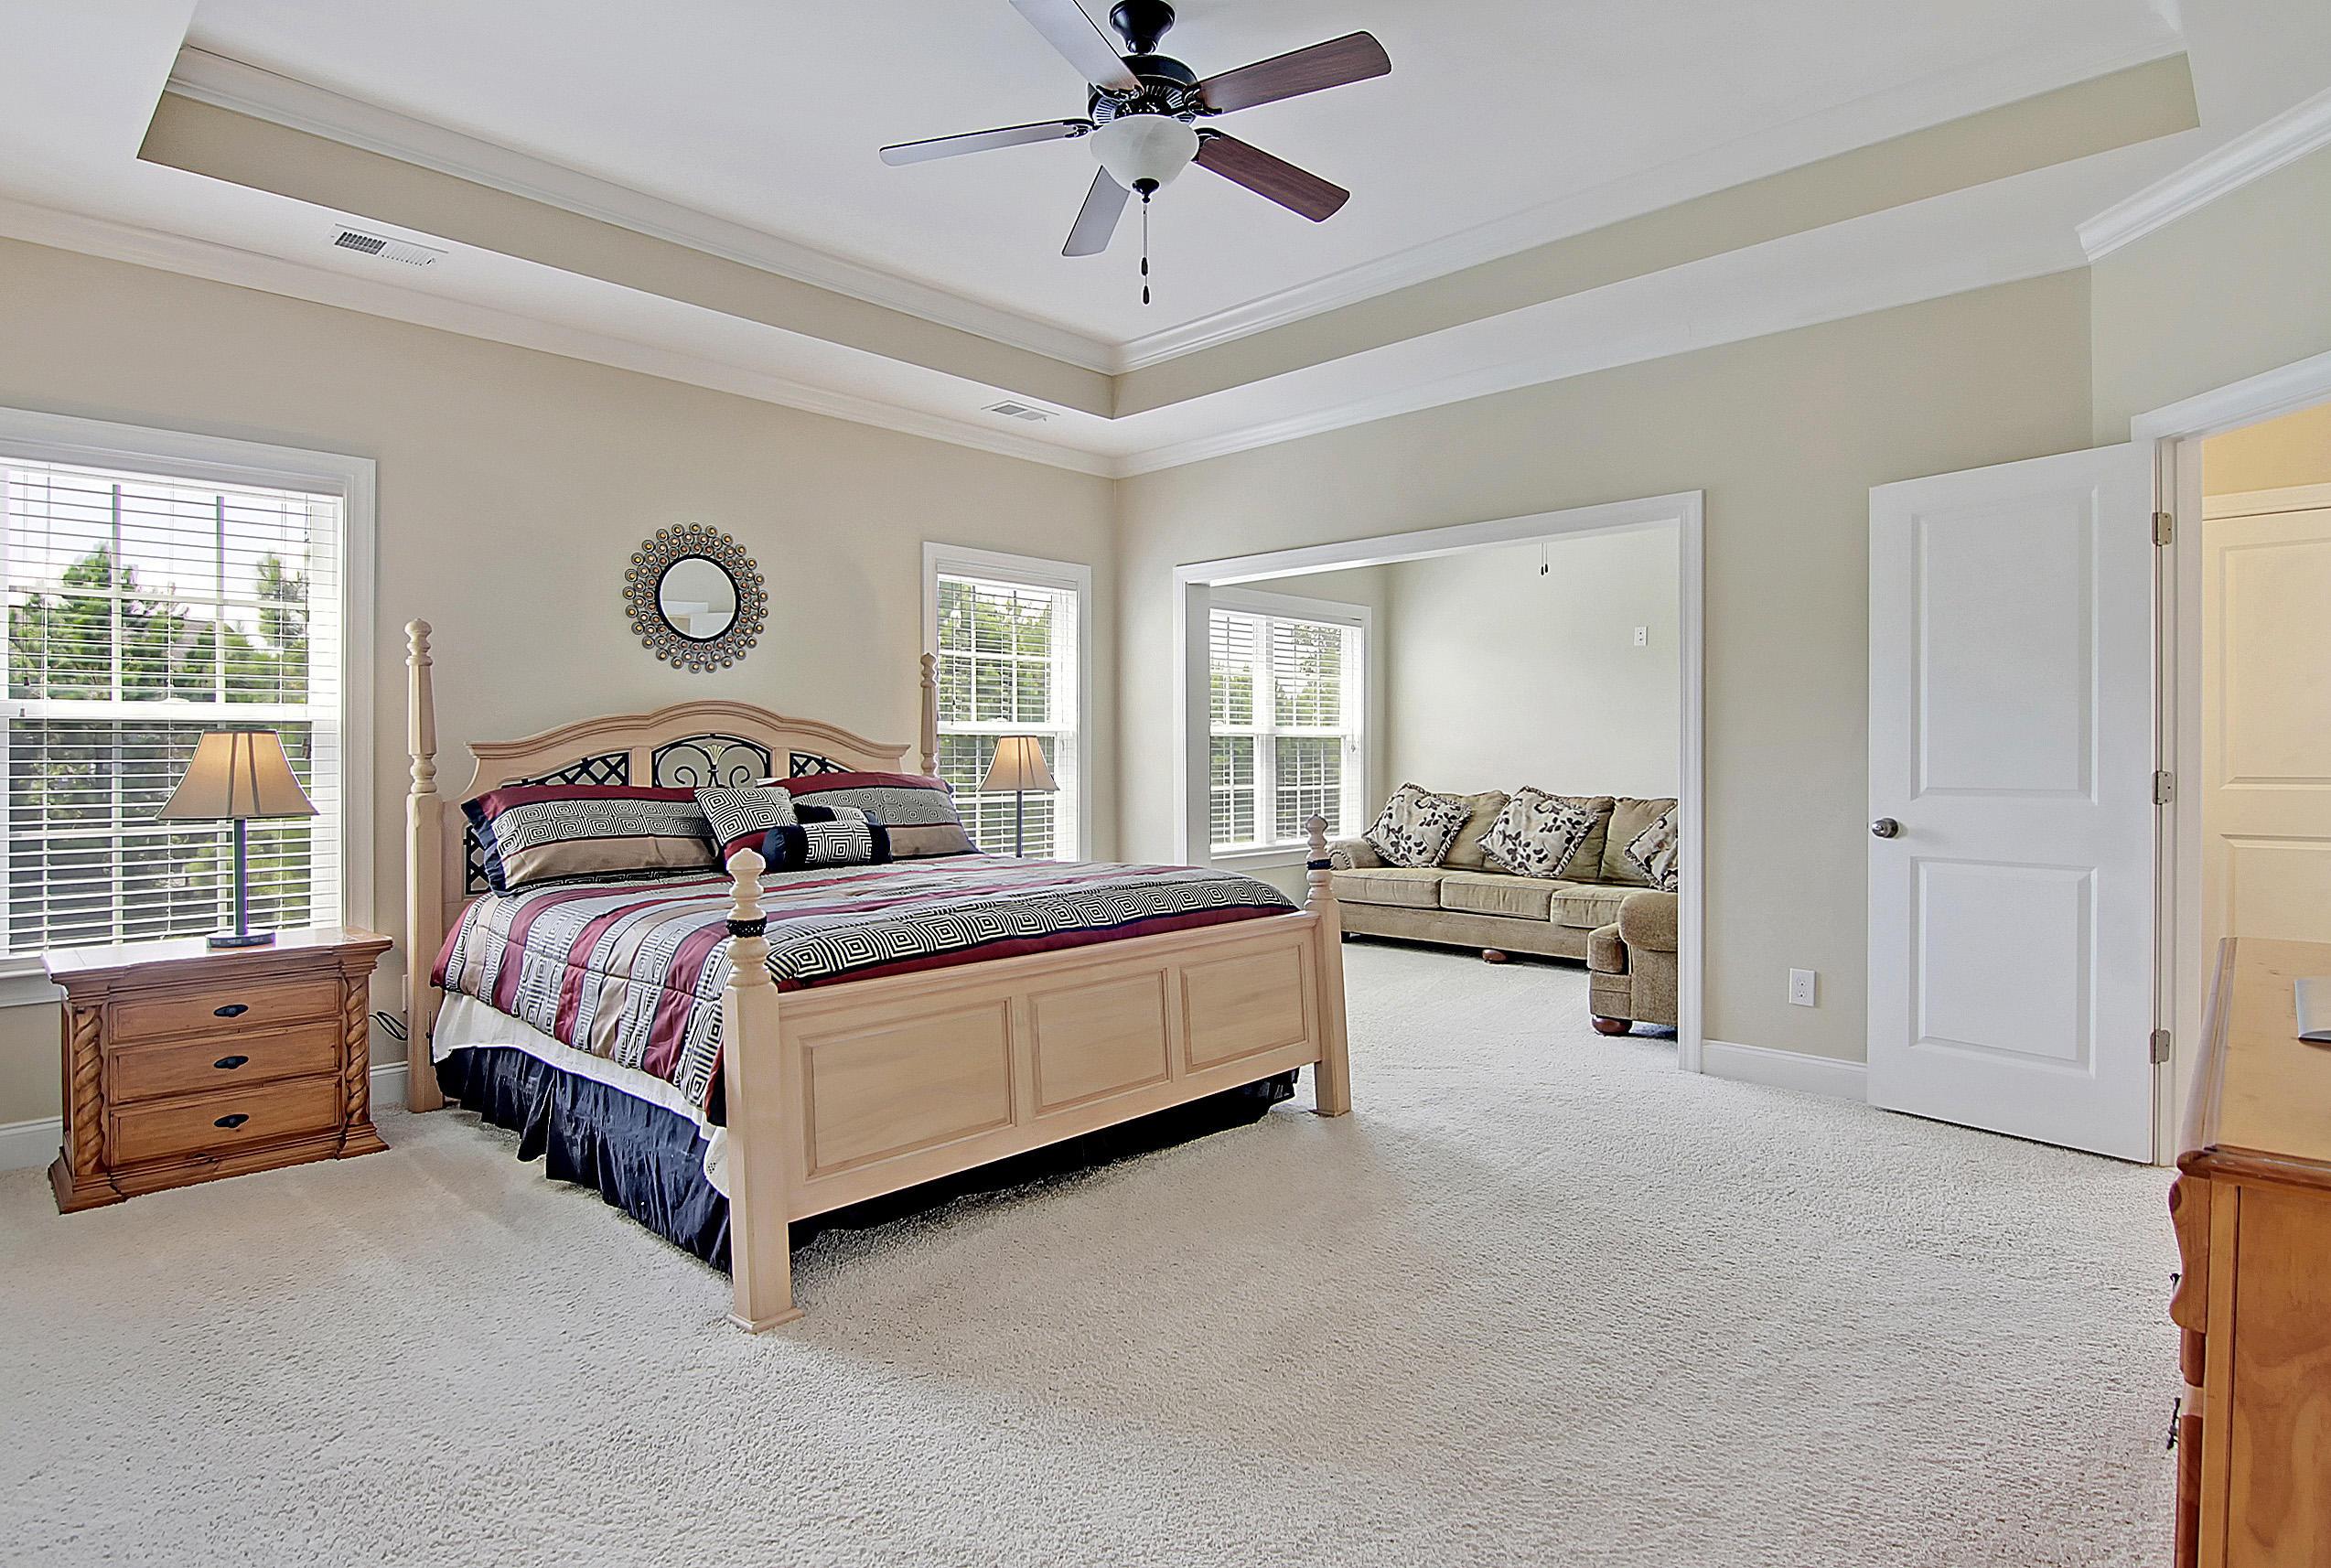 Dunes West Homes For Sale - 1332 Whisker Pole, Mount Pleasant, SC - 3